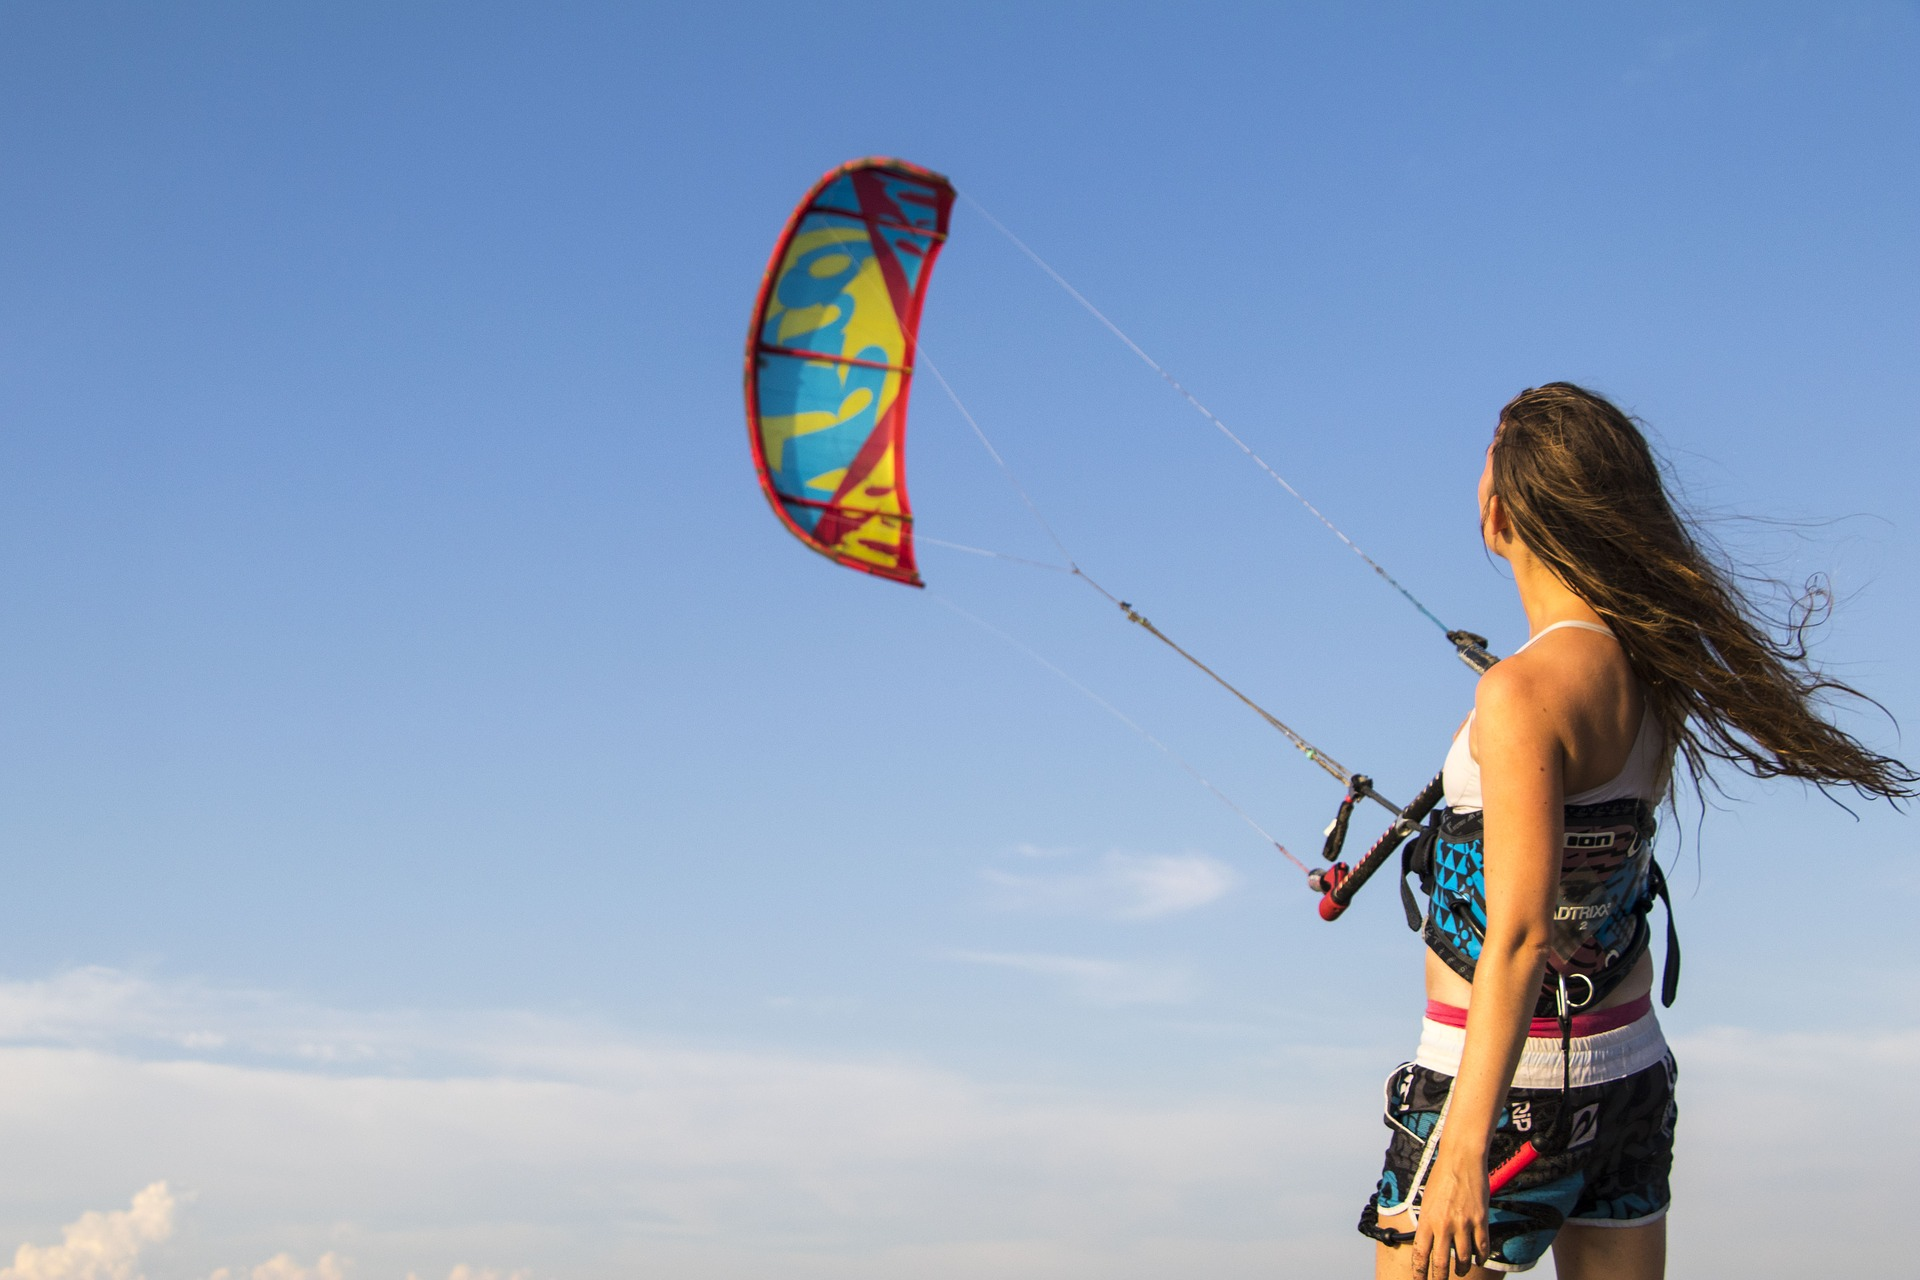 kurs kitesurfingu półwysep helski